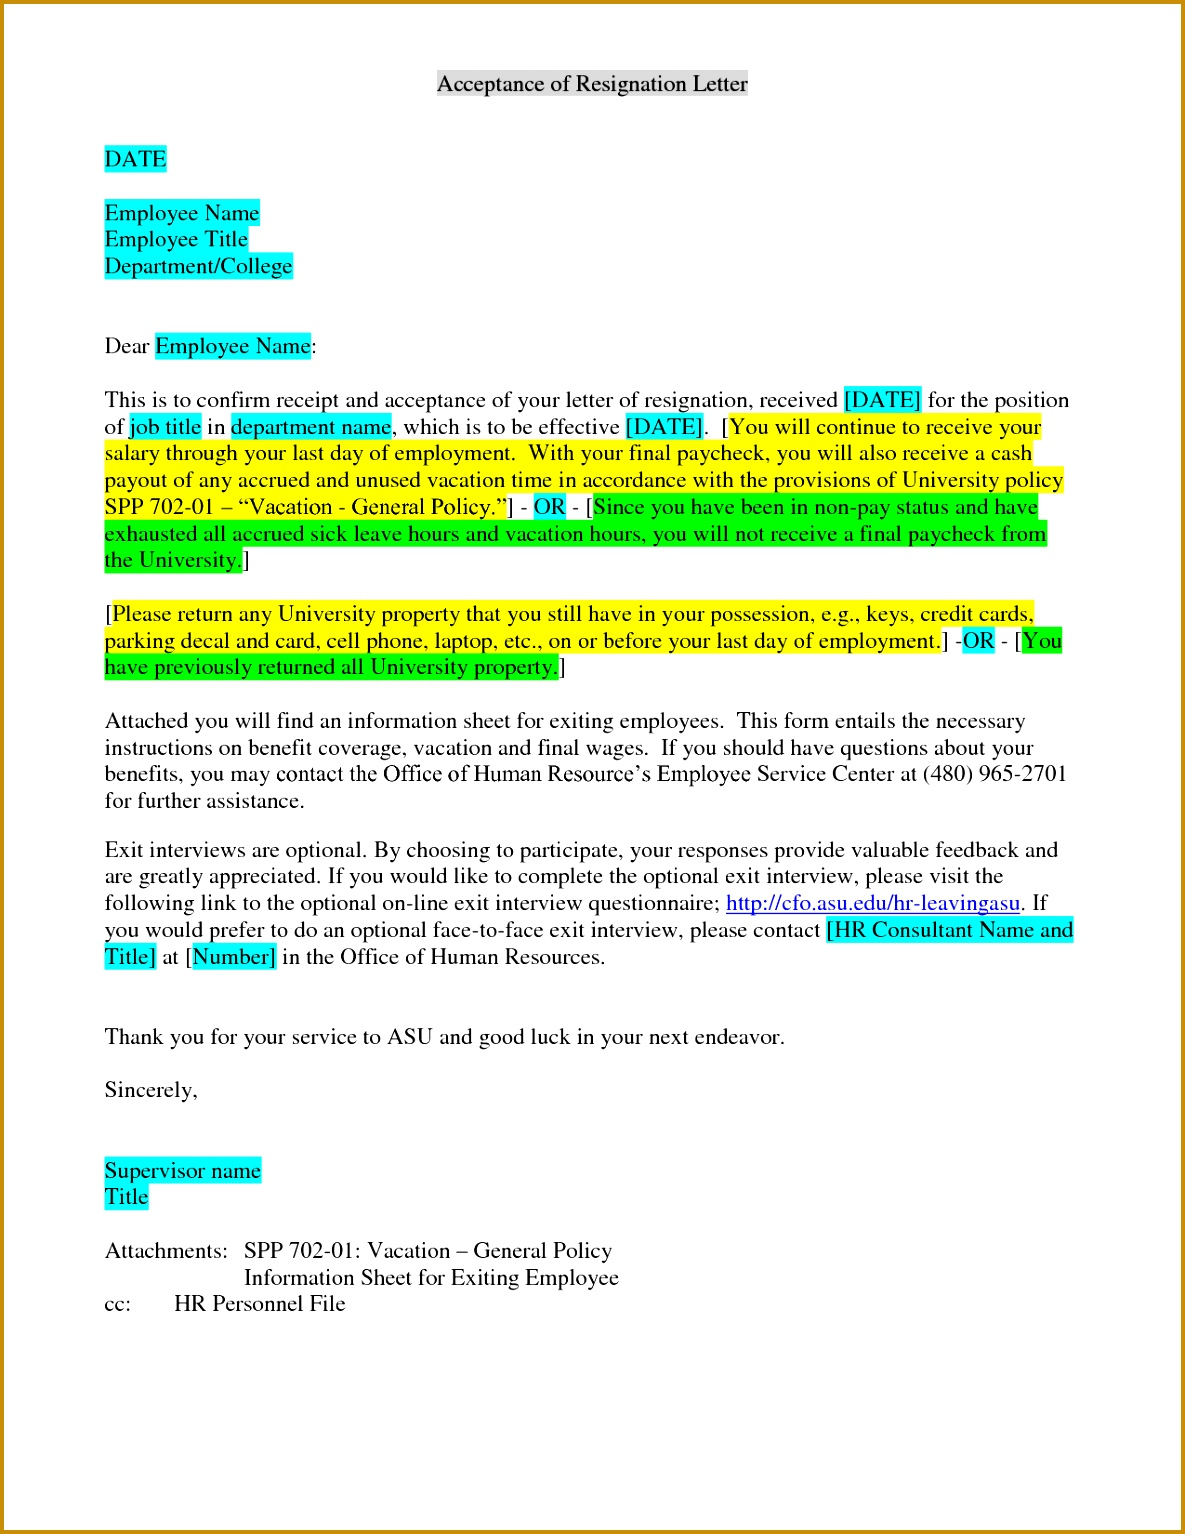 acceptance letter resignation 15341185